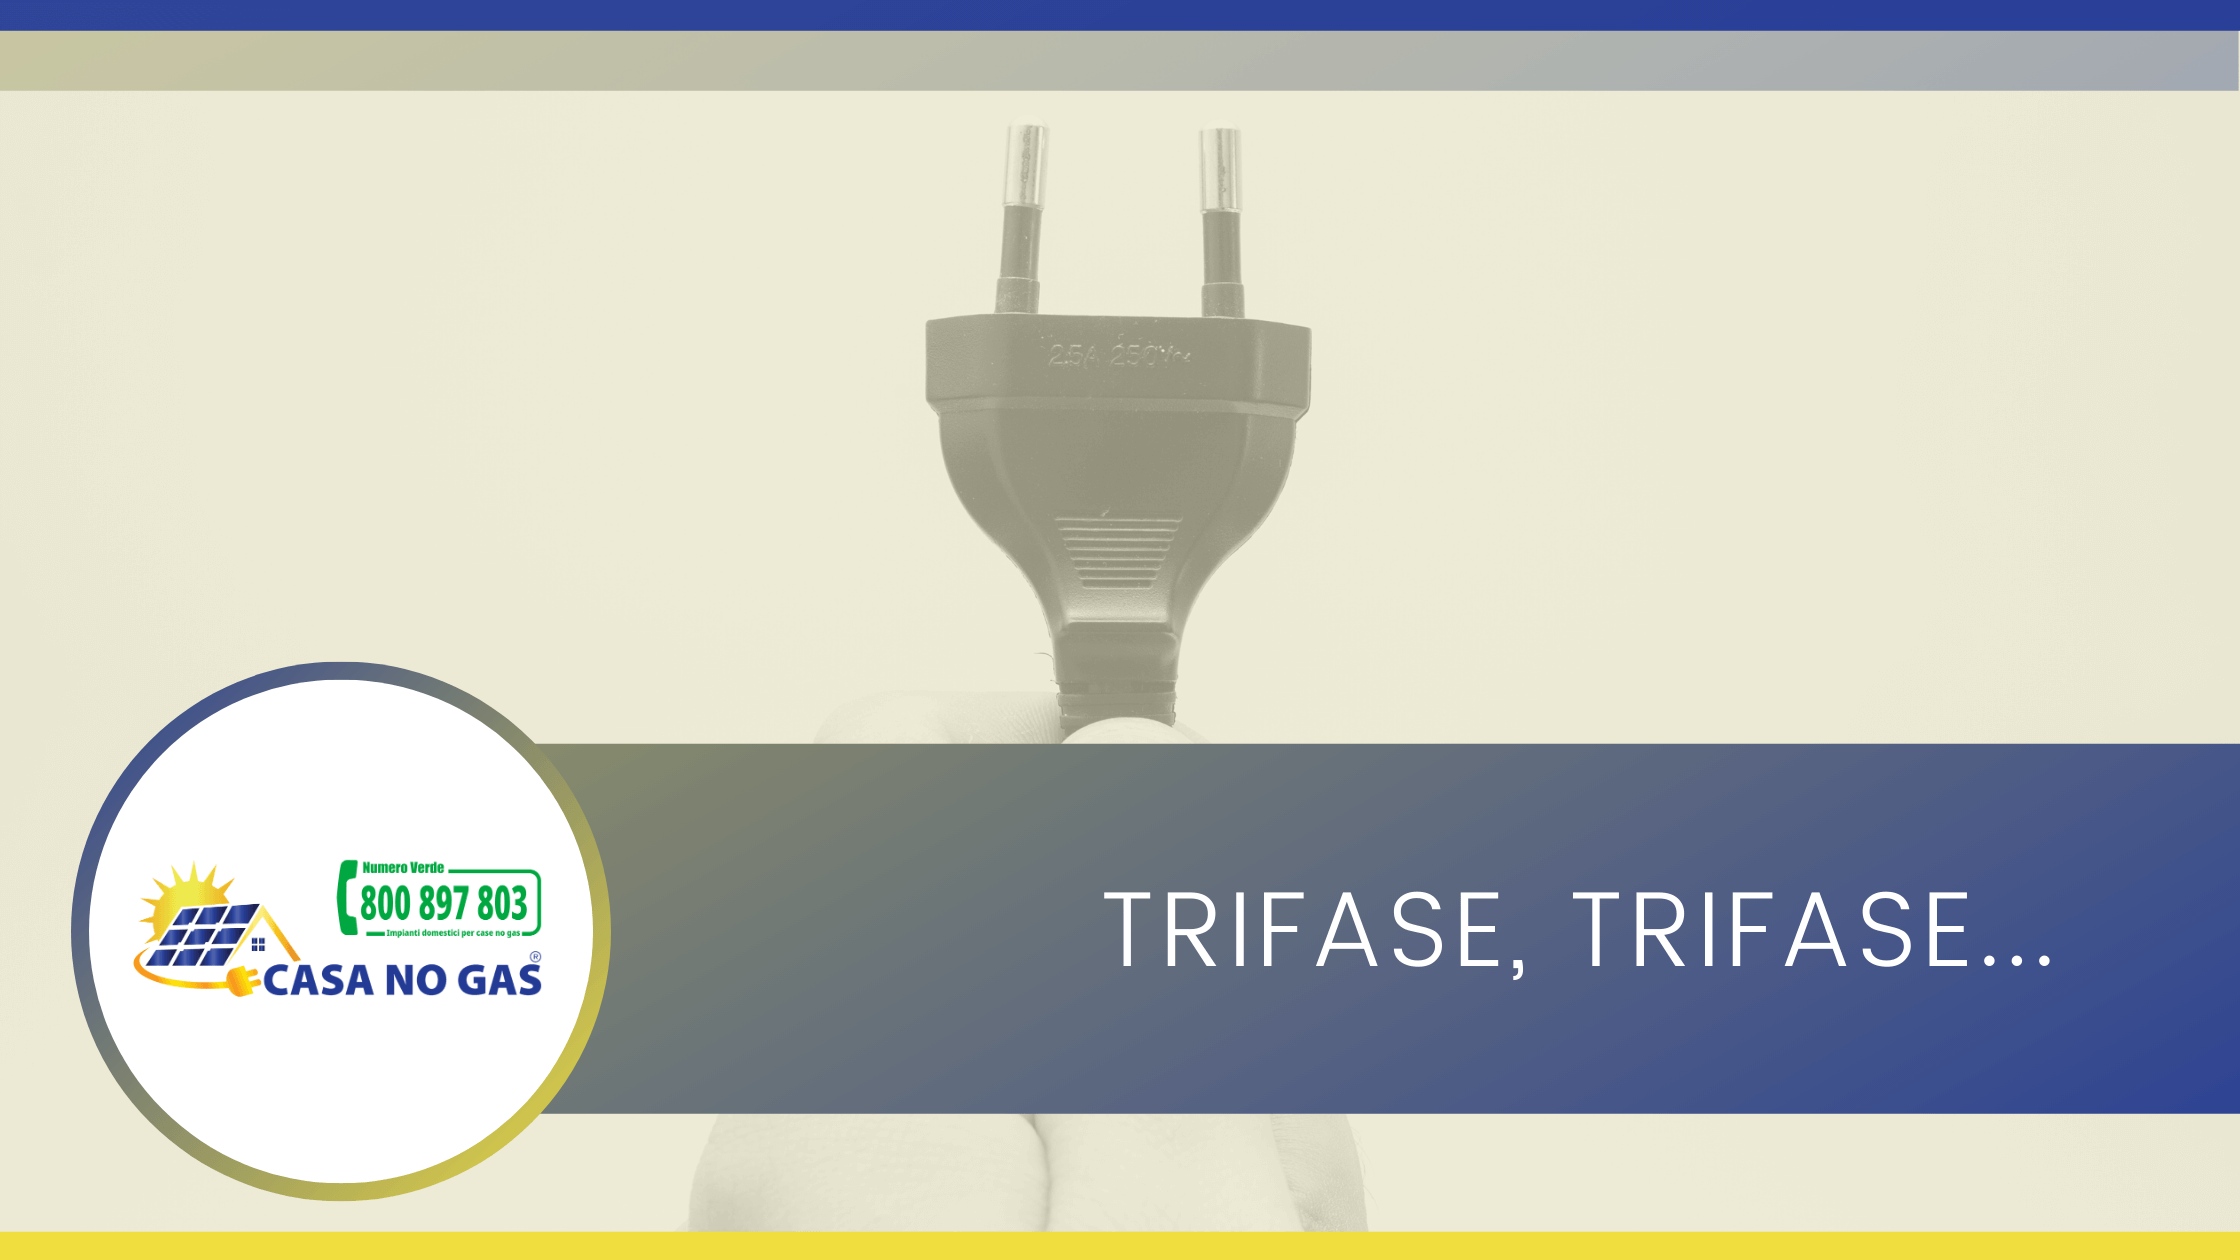 Trifase